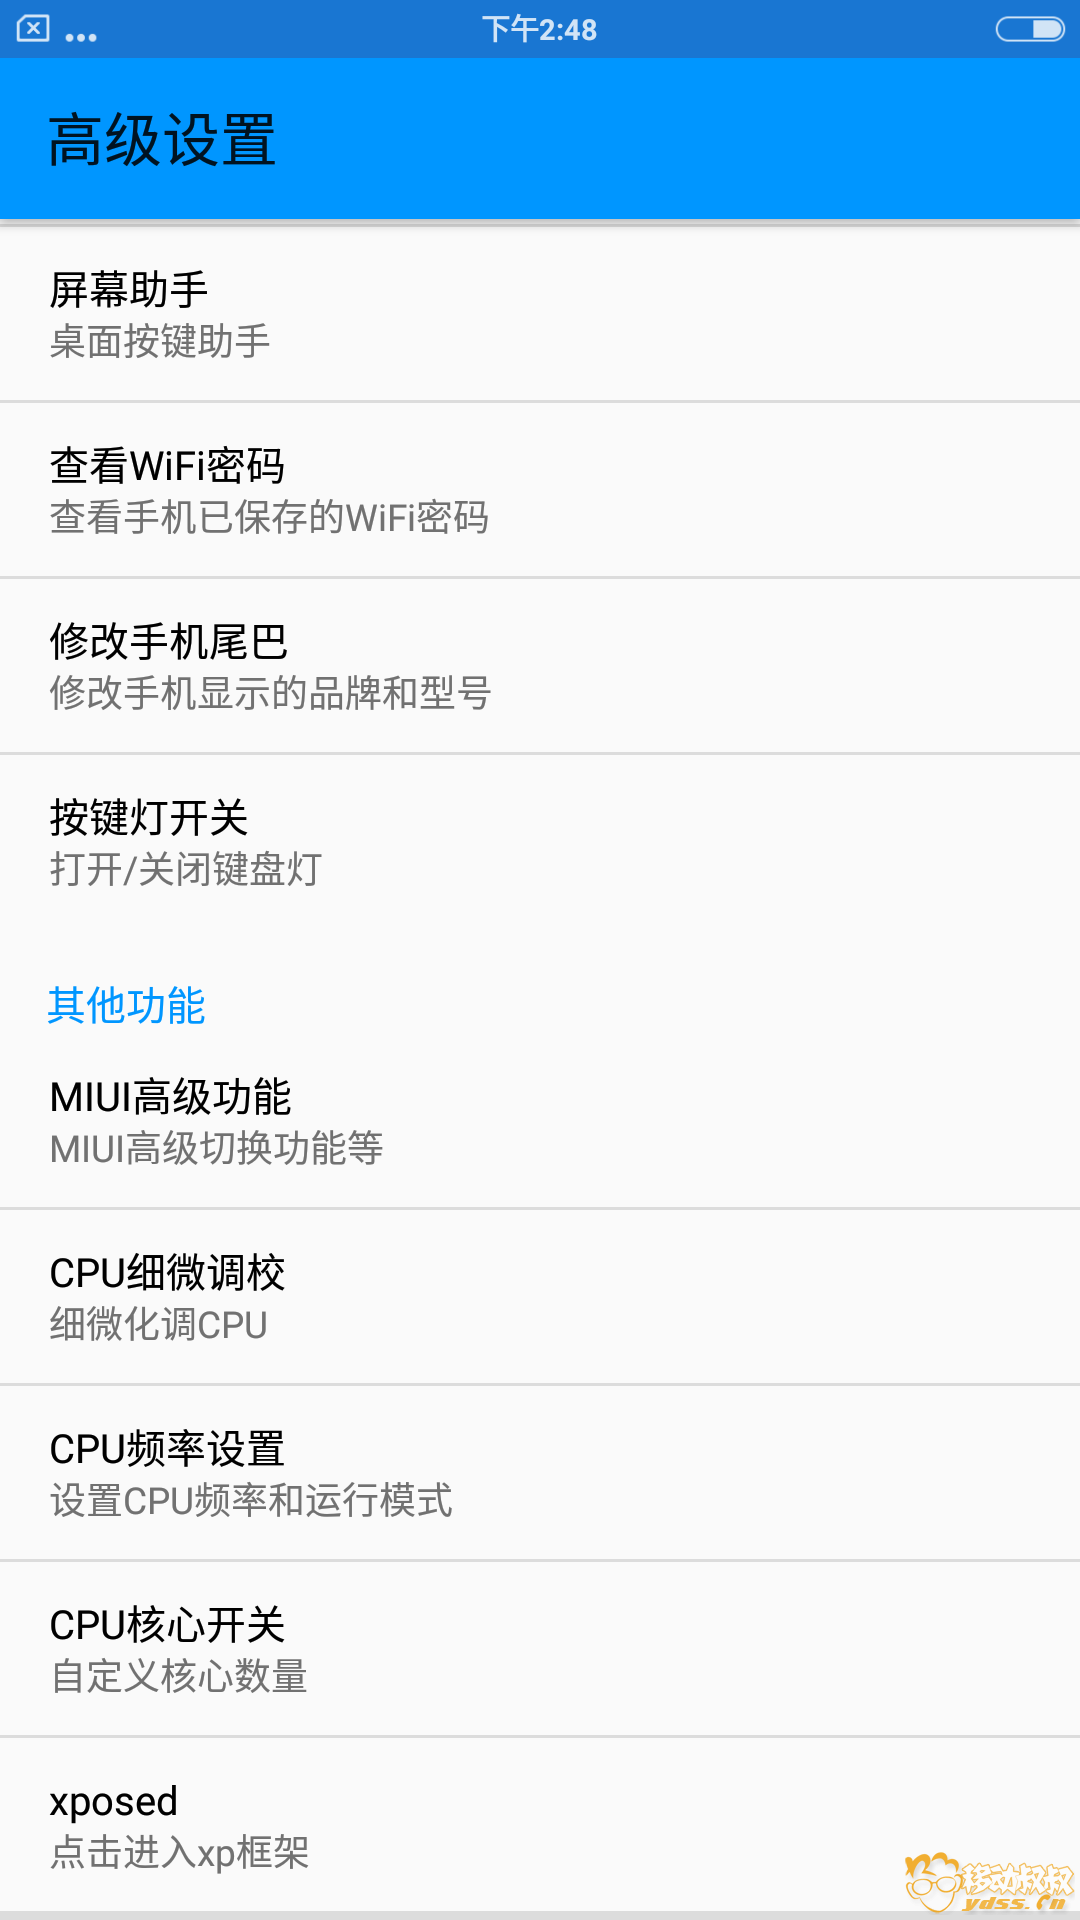 Screenshot_2017-08-19-14-48-24-538_com.zhanhong.tools.png